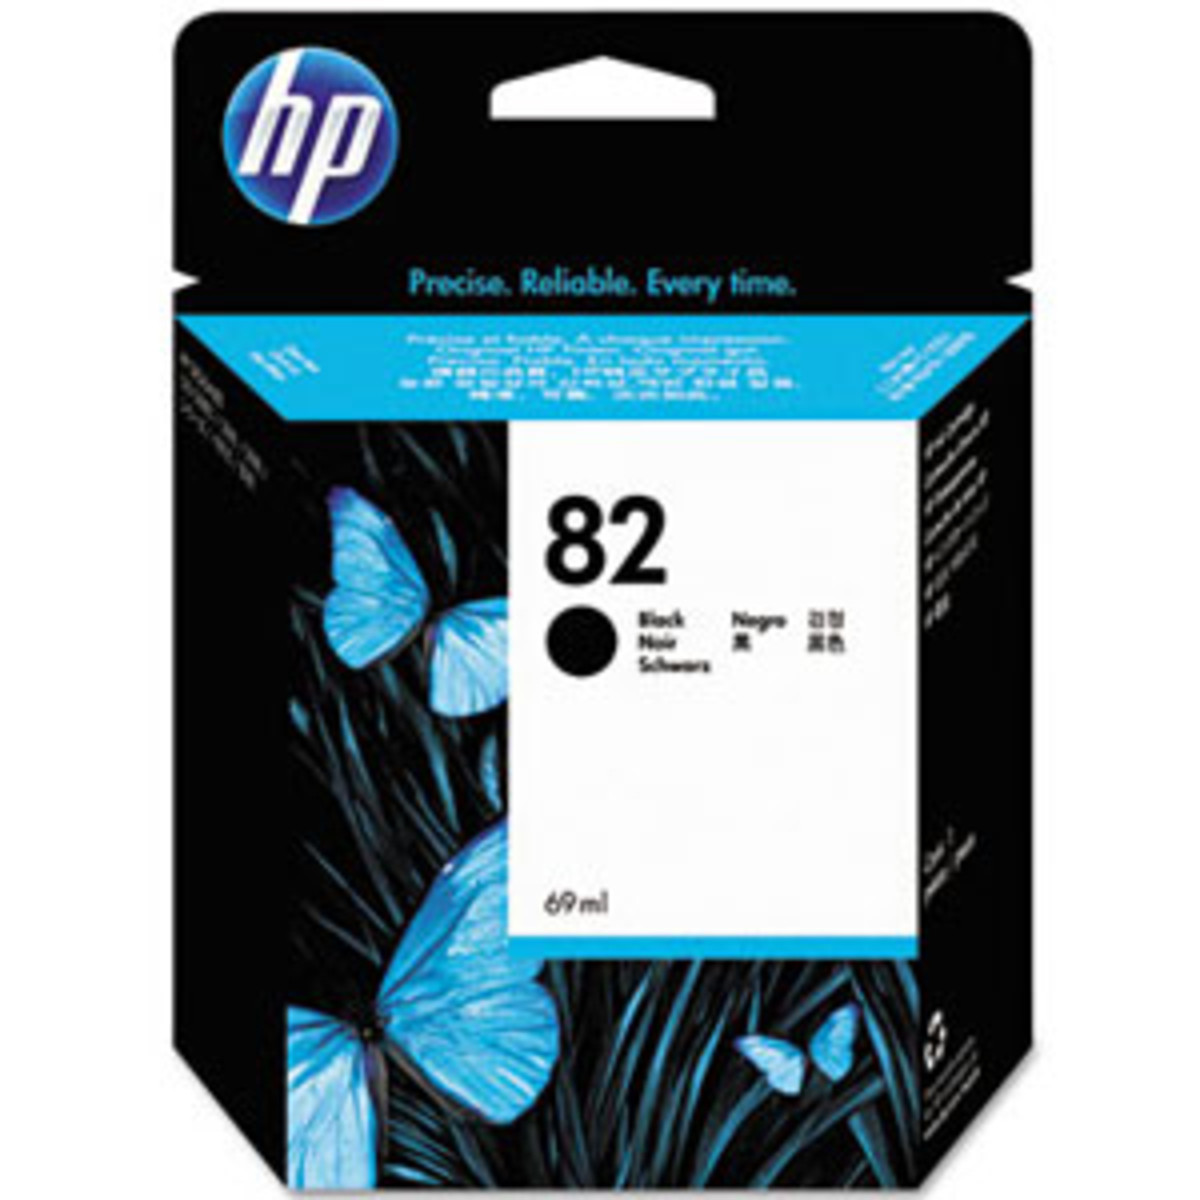 HP 82 (CH565A) Black Ink Cartridge